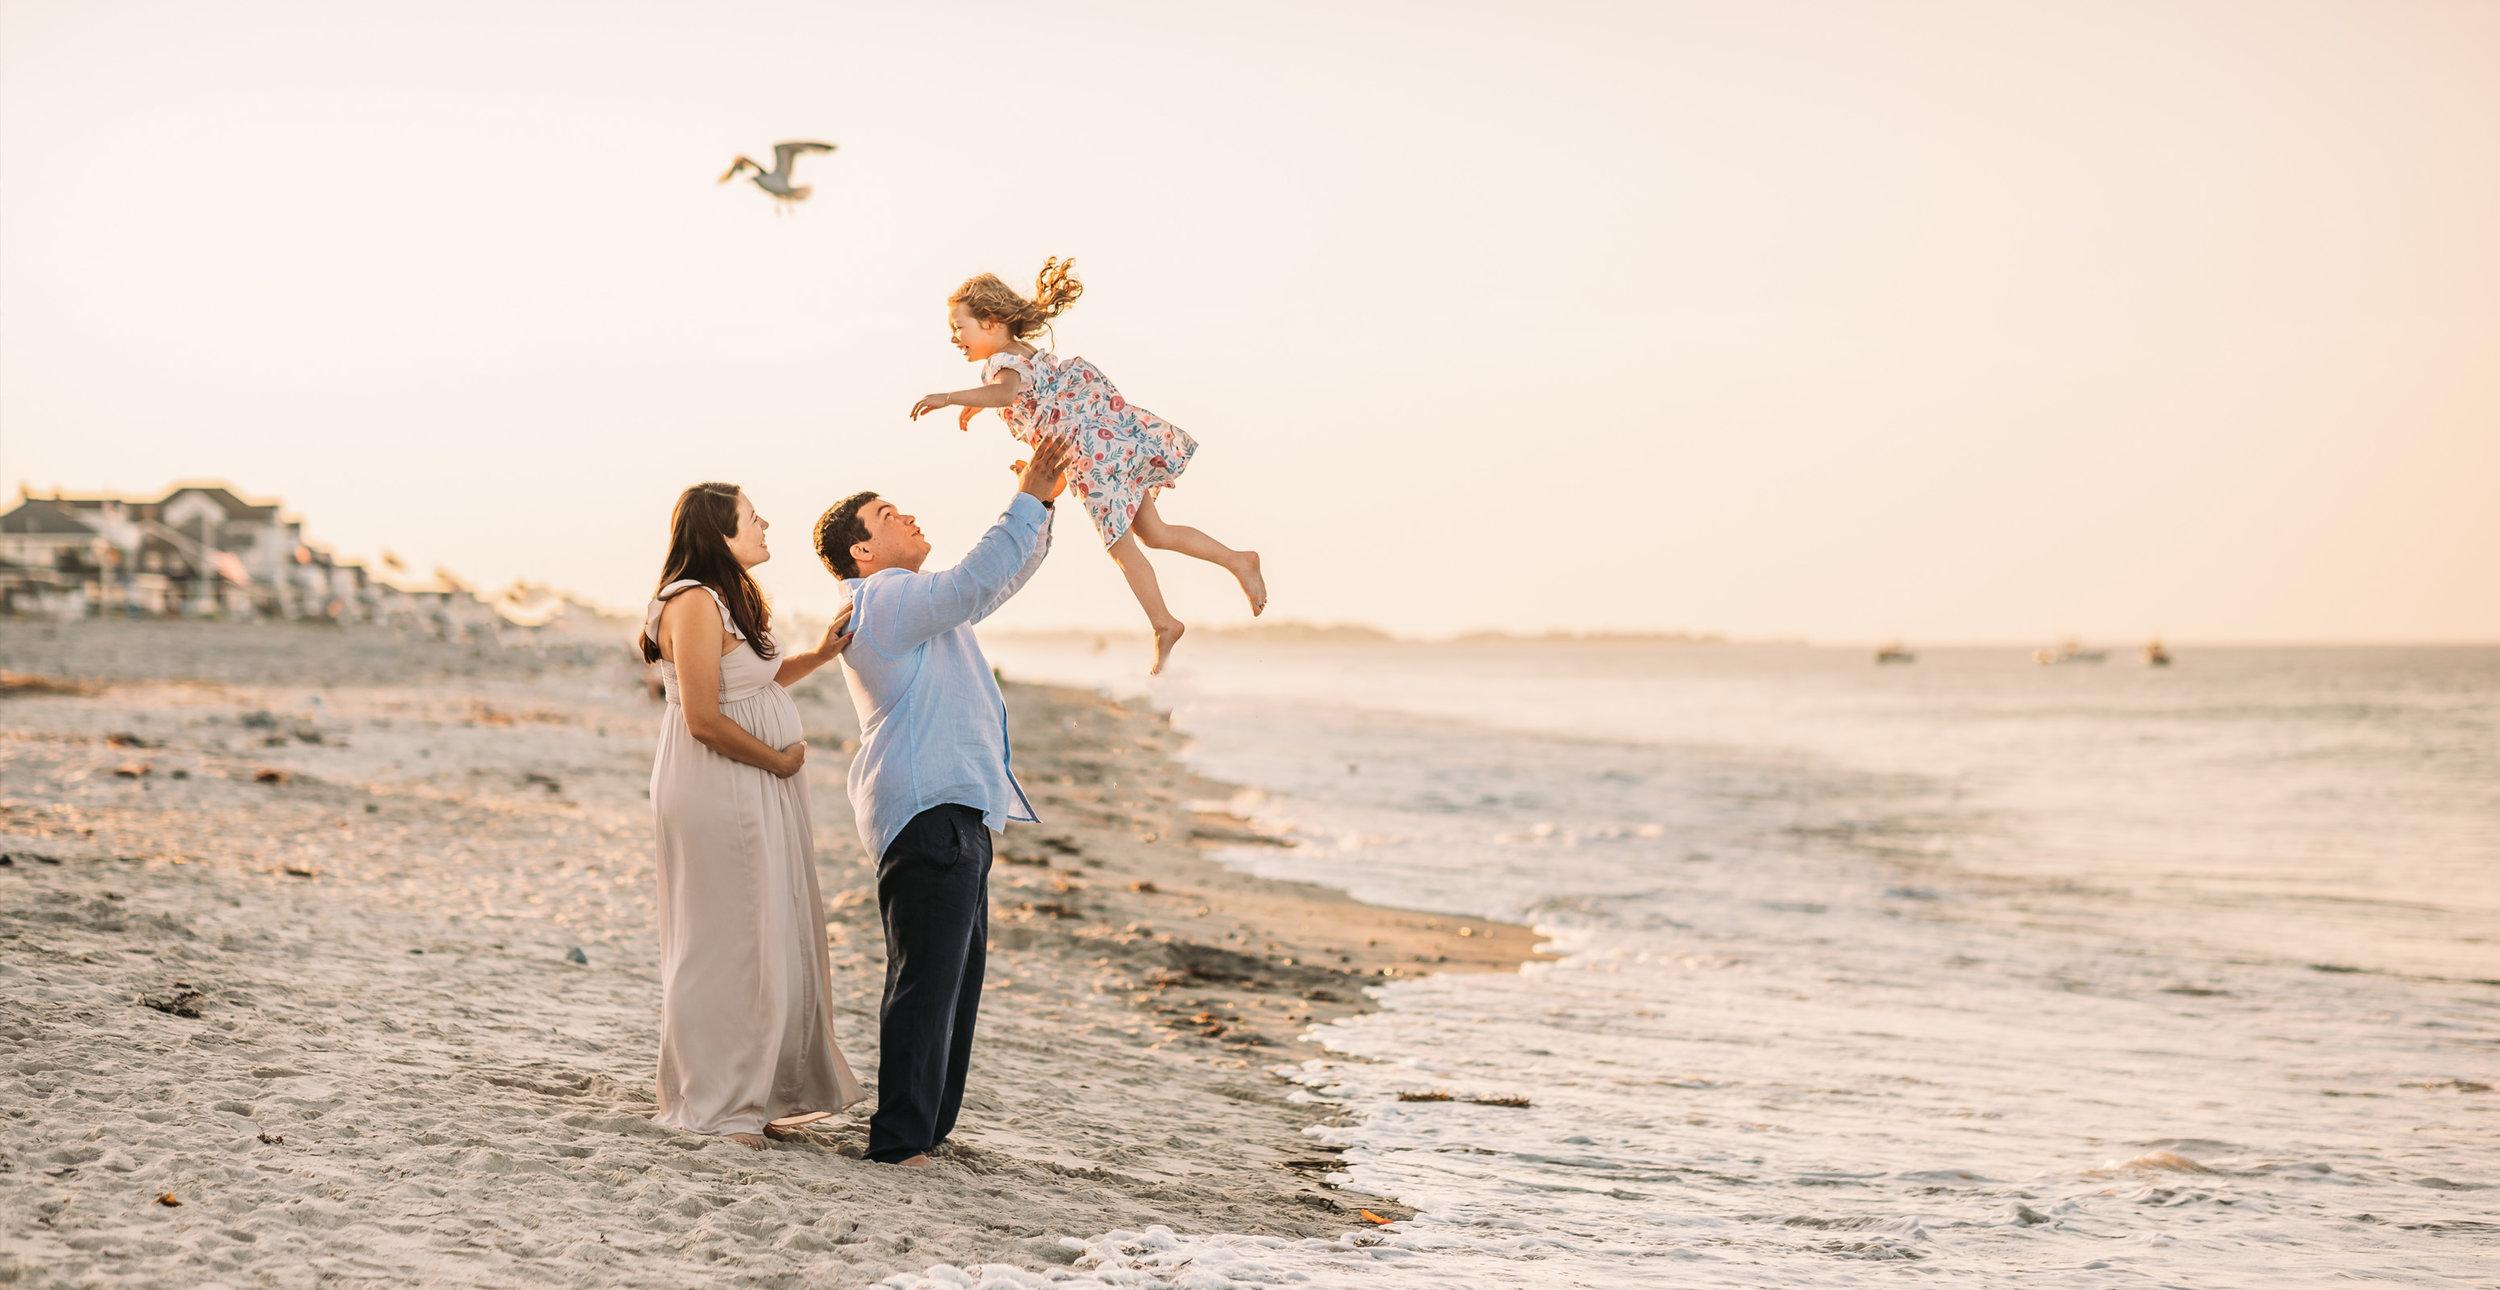 joyleducphotography-bostonfamilyphotographer-lifestyleportraiture-23.jpg